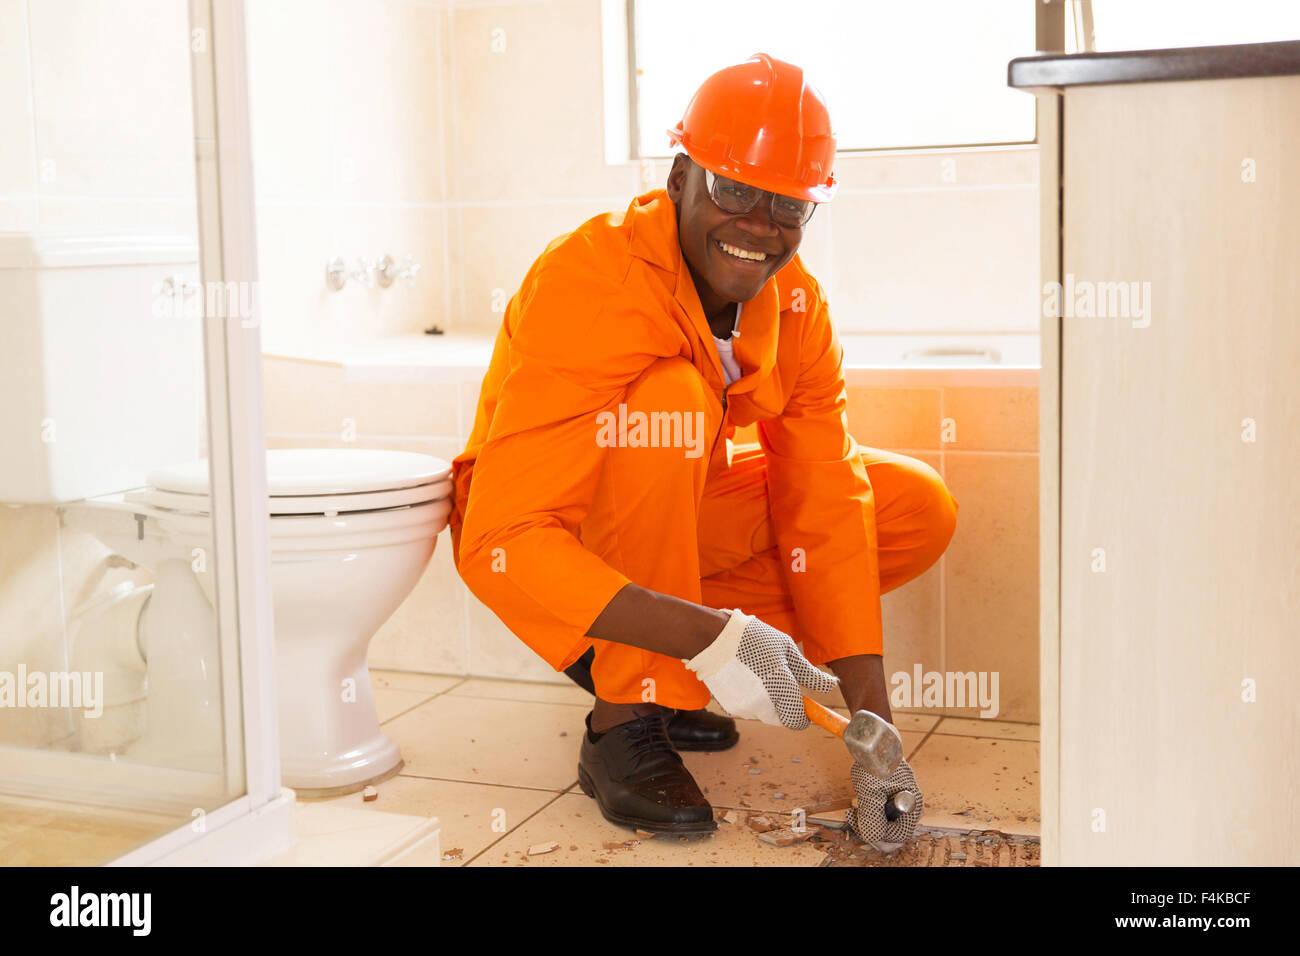 African tiles bathroom - Stock Photo Cheerful African American Construction Worker Removing Floor Tiles In Bathroom